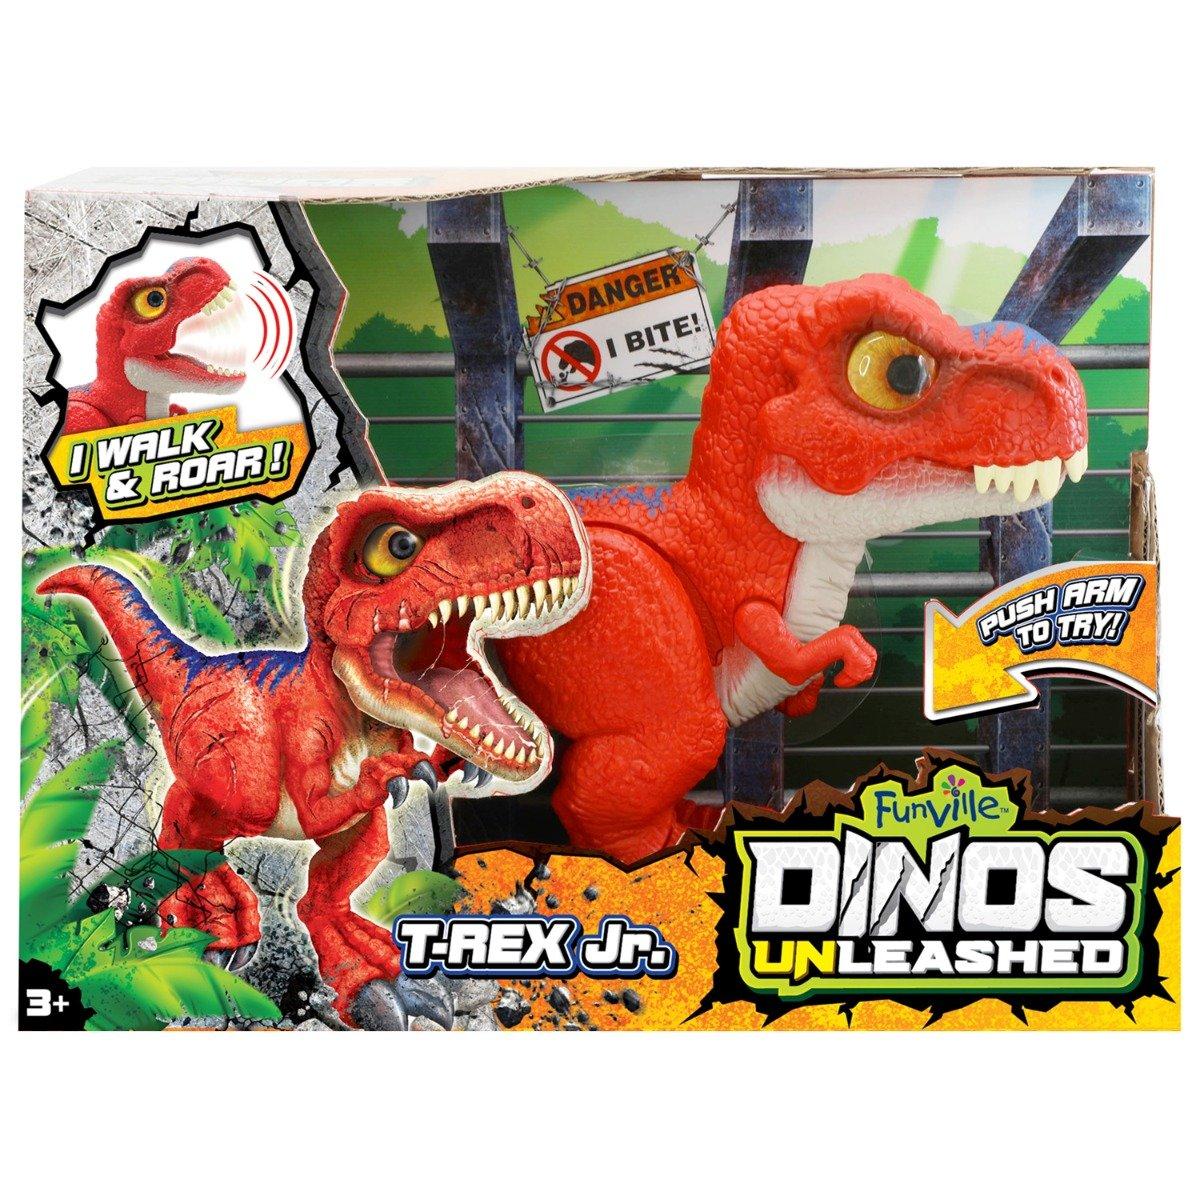 Jucarie interactiva Dinos Unleashed, T-Rex Jr.